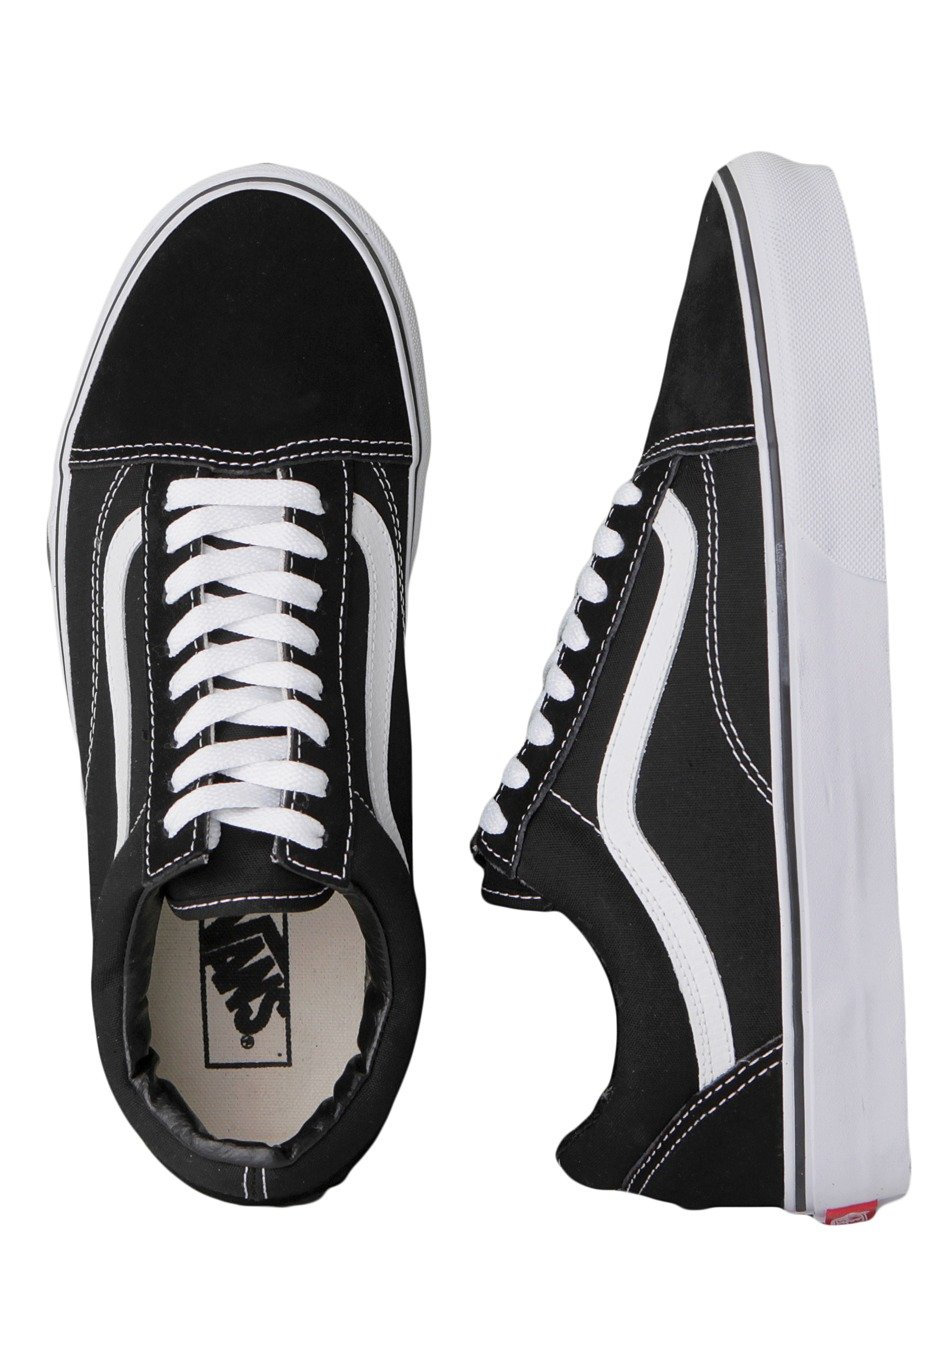 Vans - Old Skool Black White - Girl Shoes - Impericon.com US 8d1d36c04